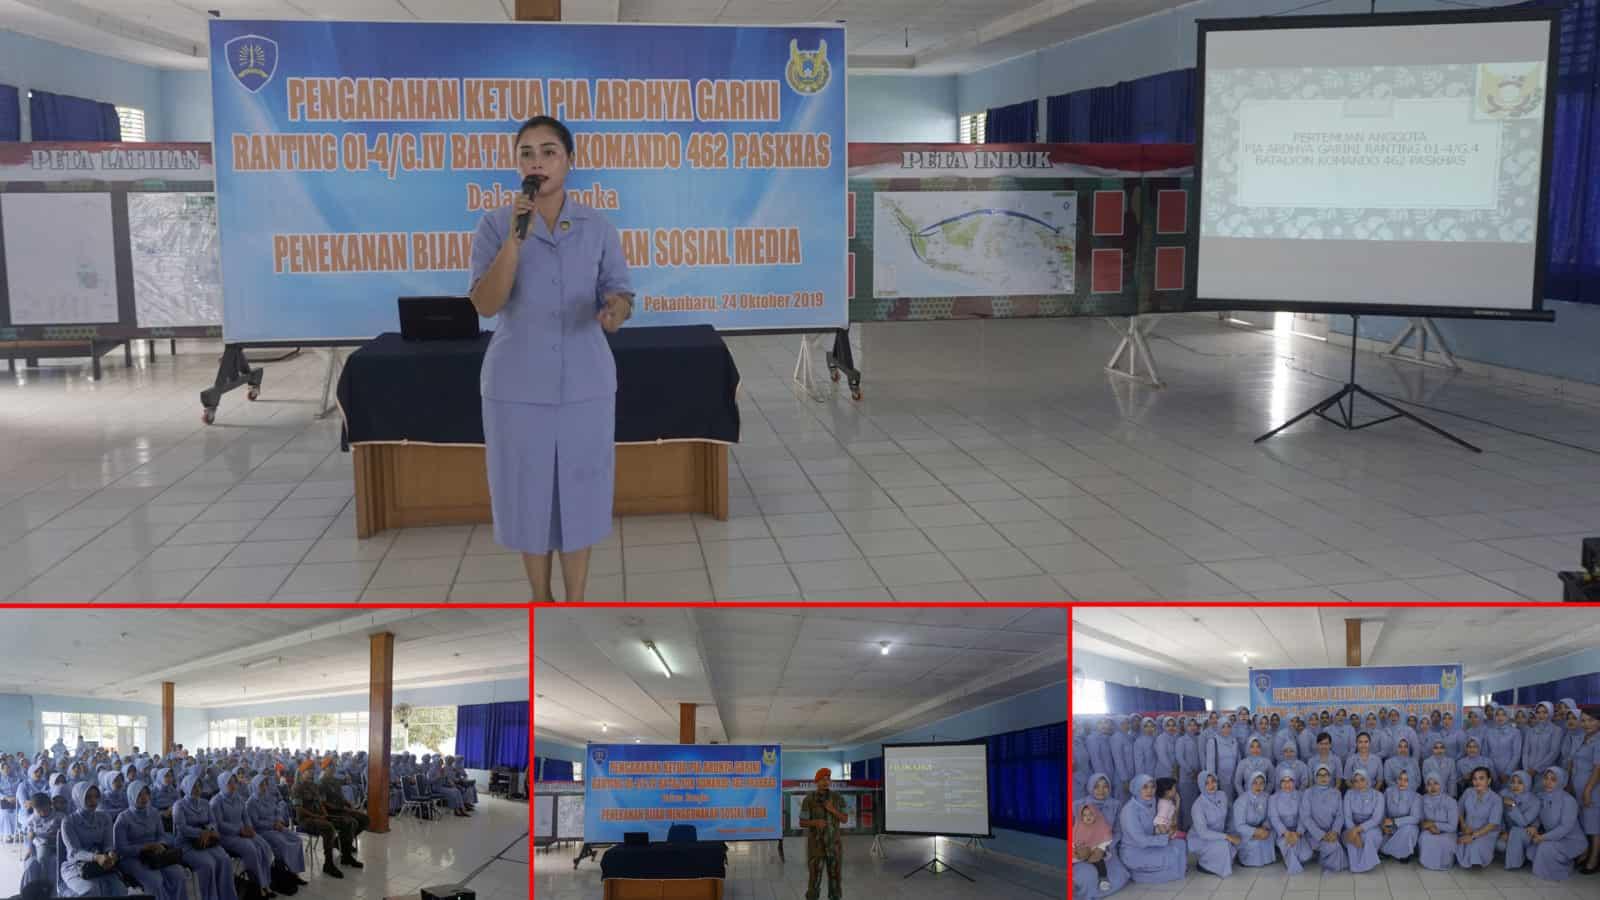 Ketua PIA AG Ranting 01-4/G.IV Yonko 462 Paskhas Berikan pengarahan Bijak Menggunakan Sosial Media